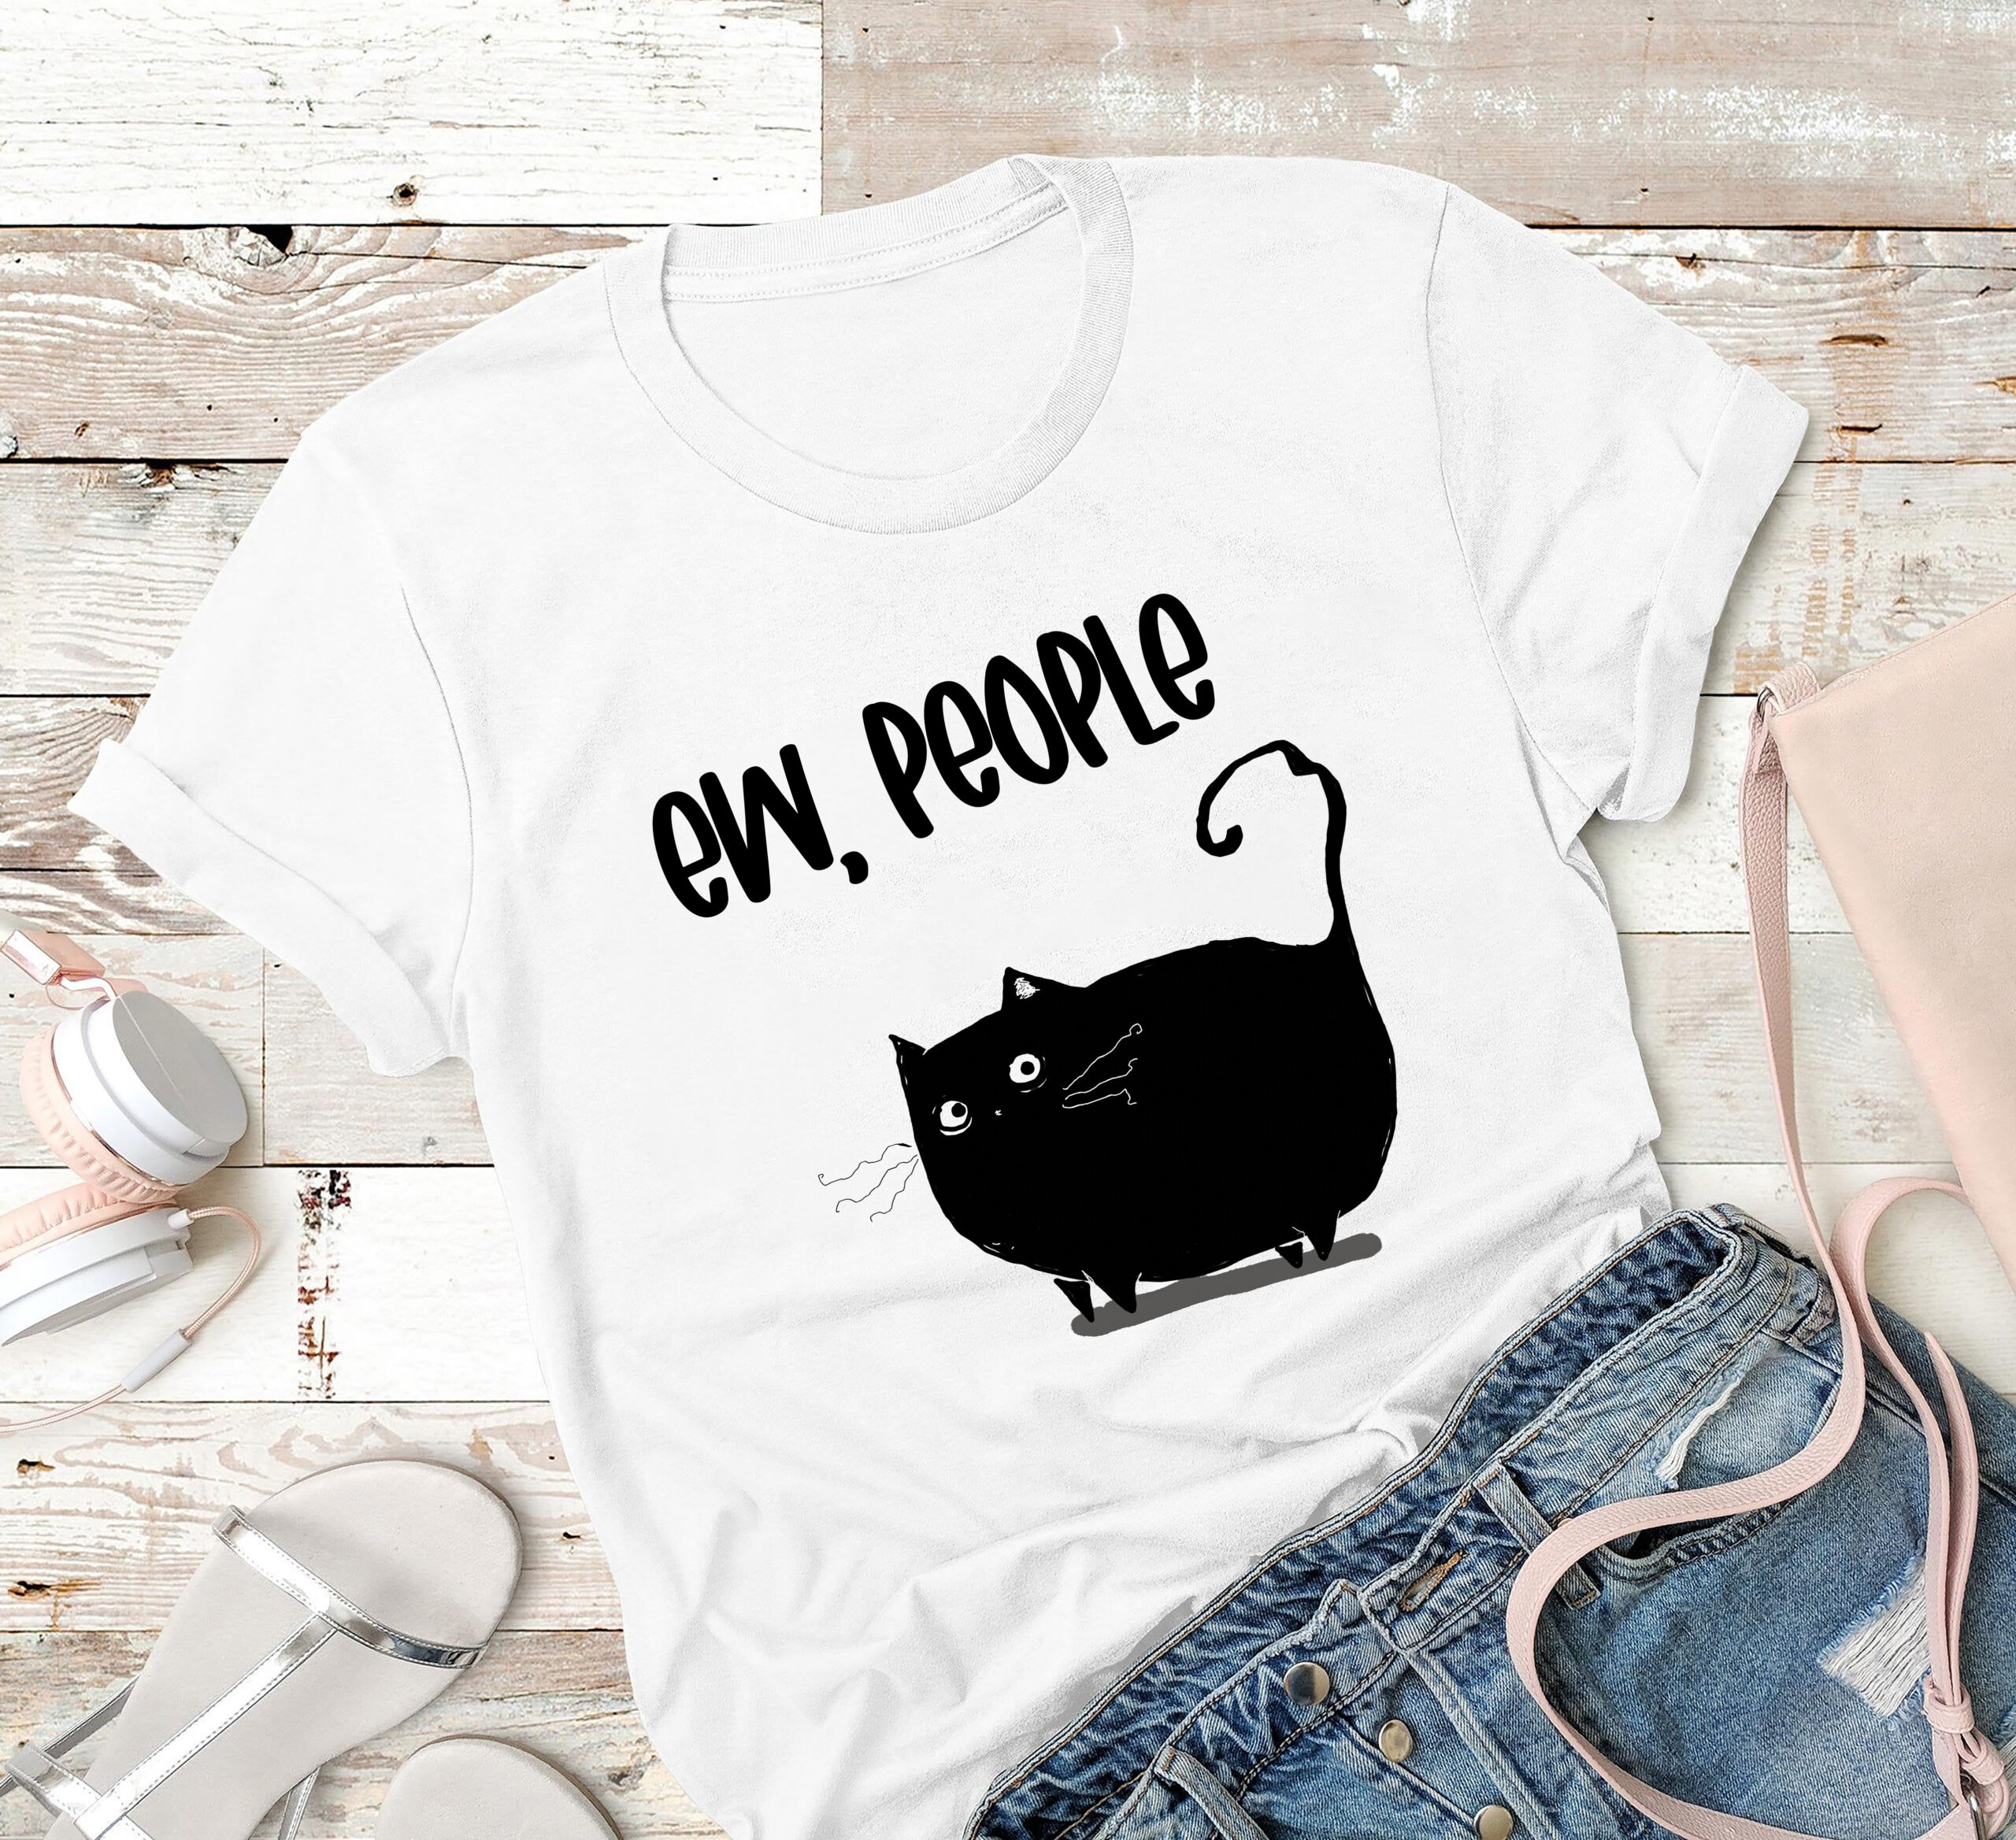 Fat Black Cat Shirt Ew People